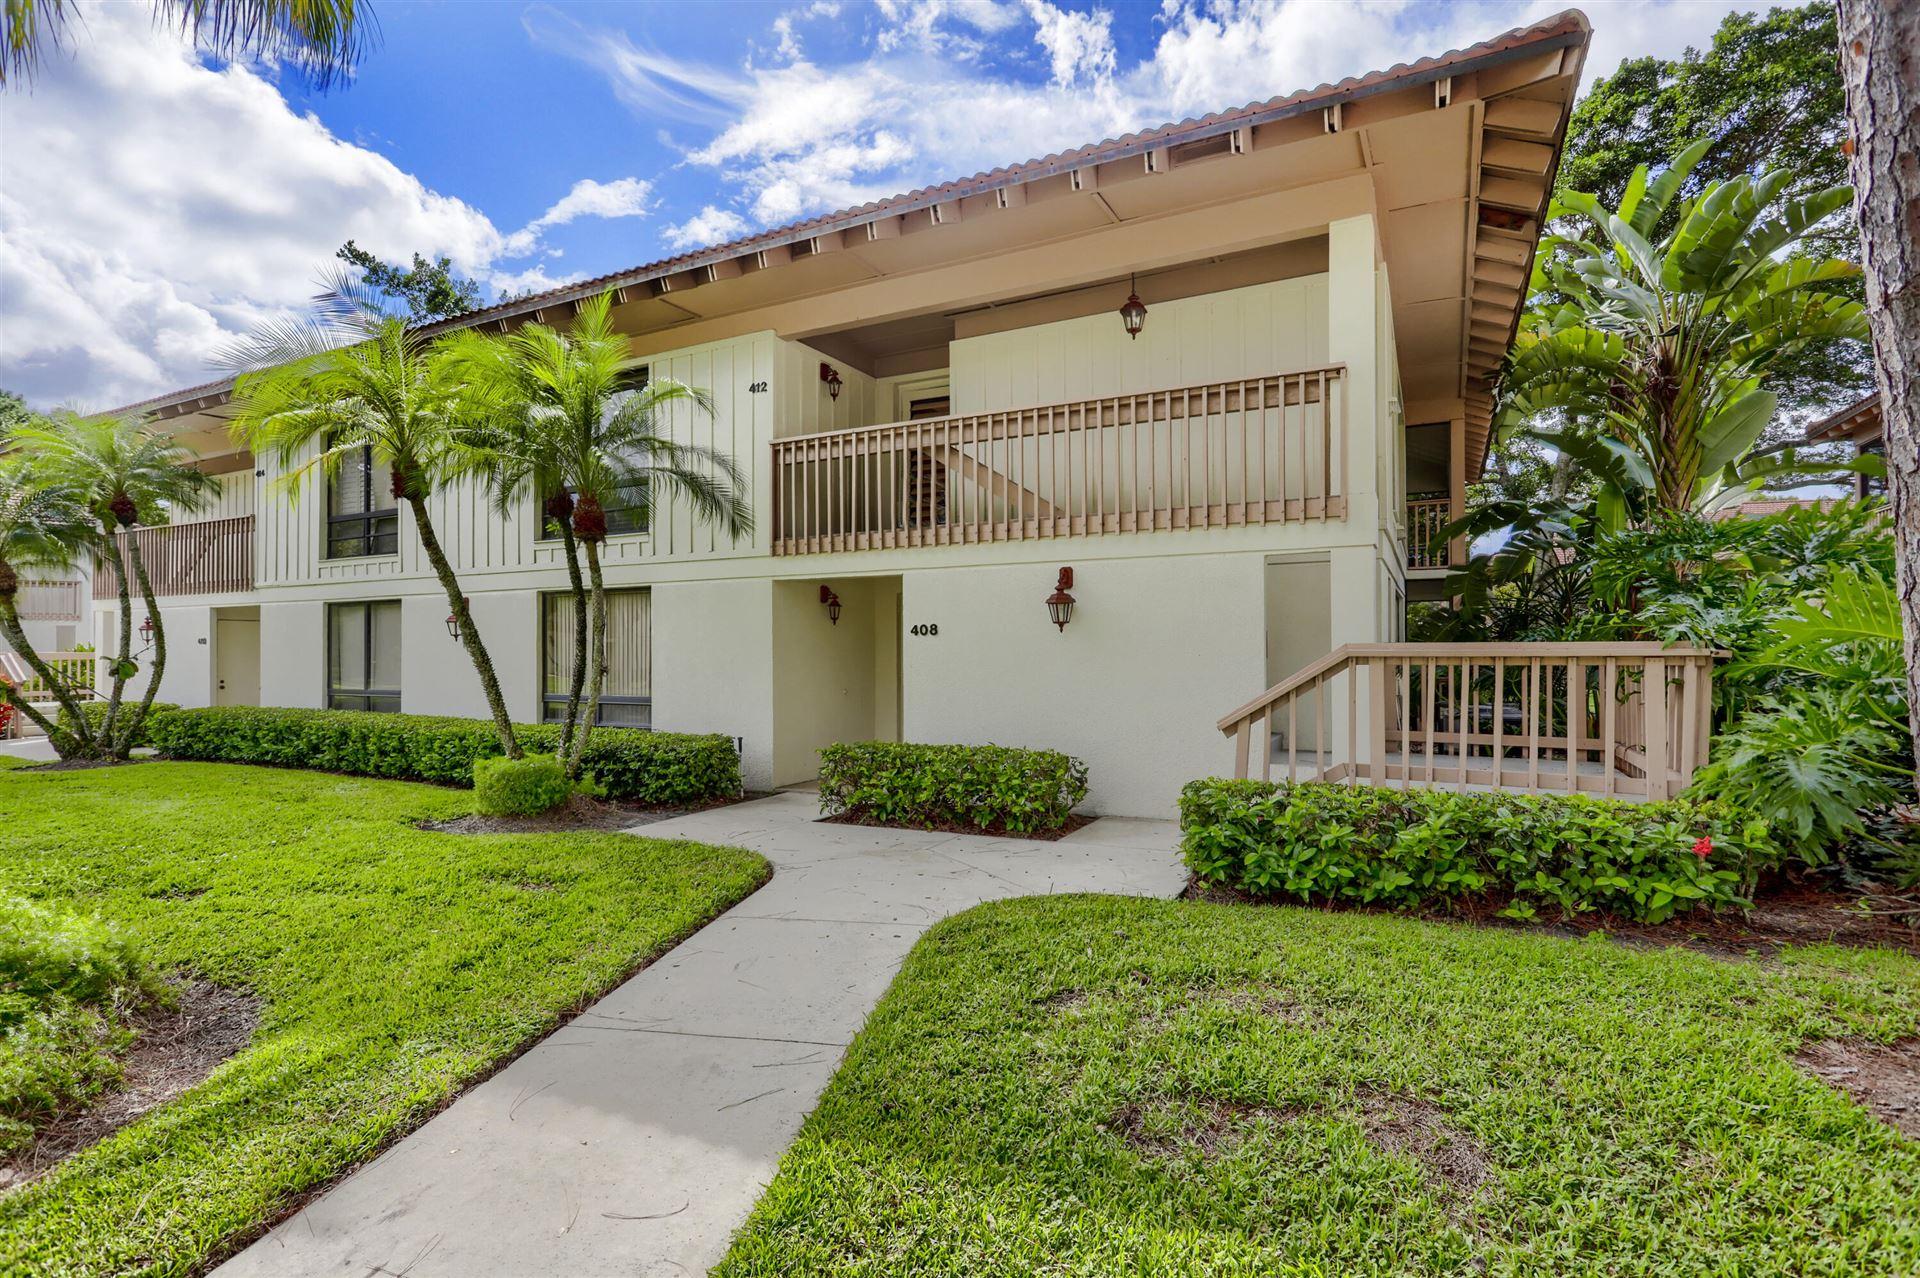 Photo of 412 S Brackenwood Lane S, Palm Beach Gardens, FL 33418 (MLS # RX-10752255)